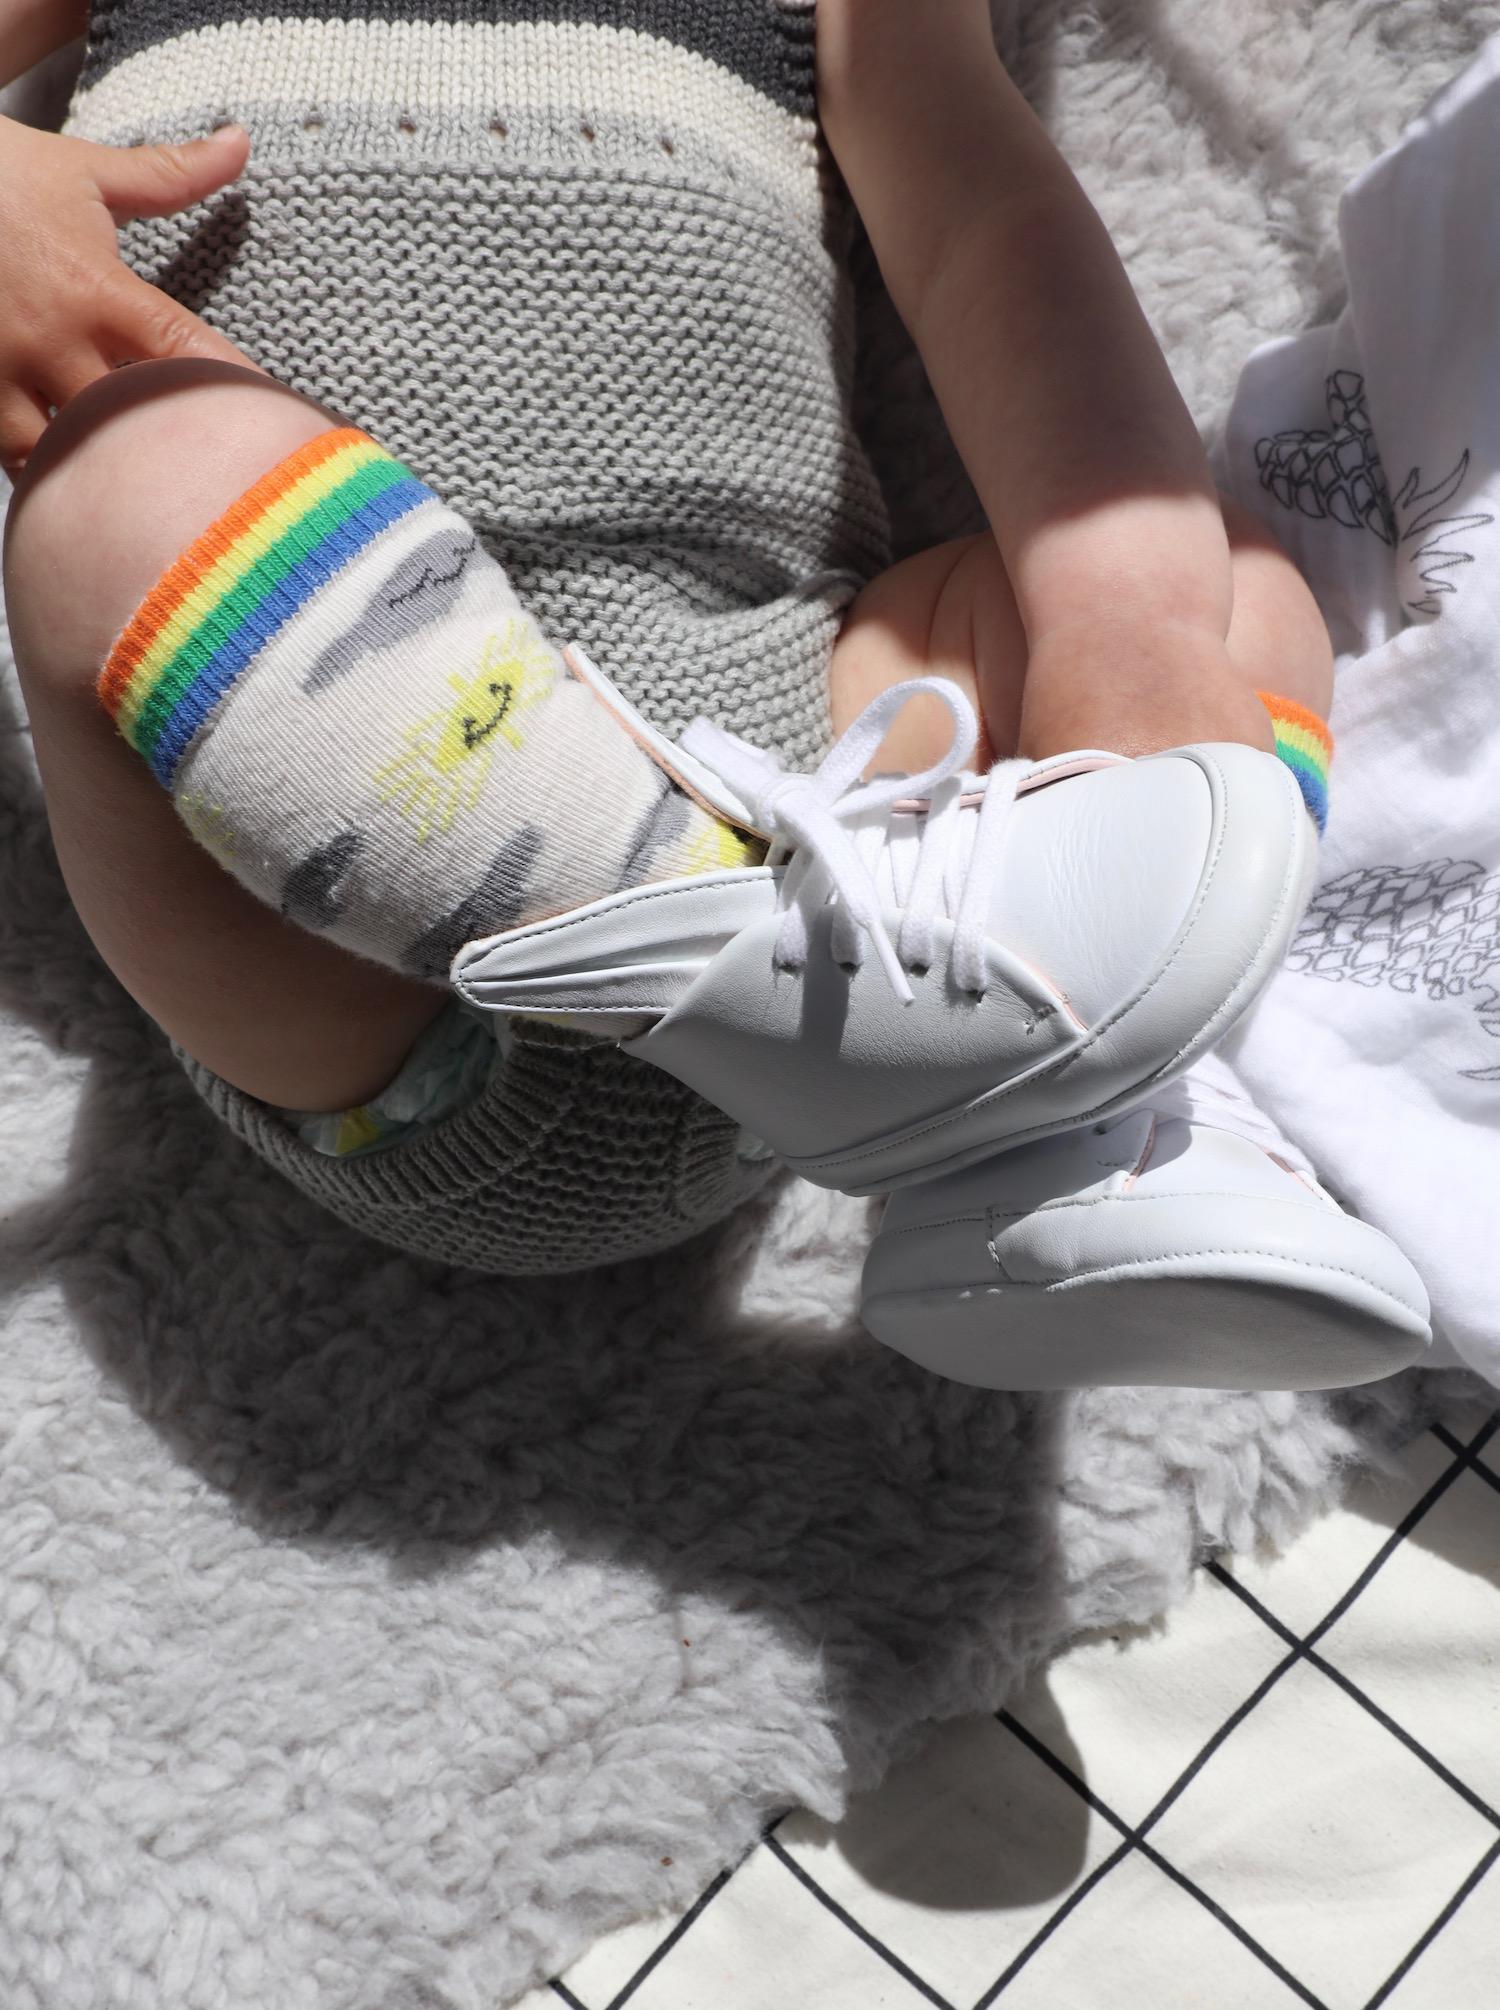 Bonnie_mob_socks_Mina_parikka_bunny_baby_trainers